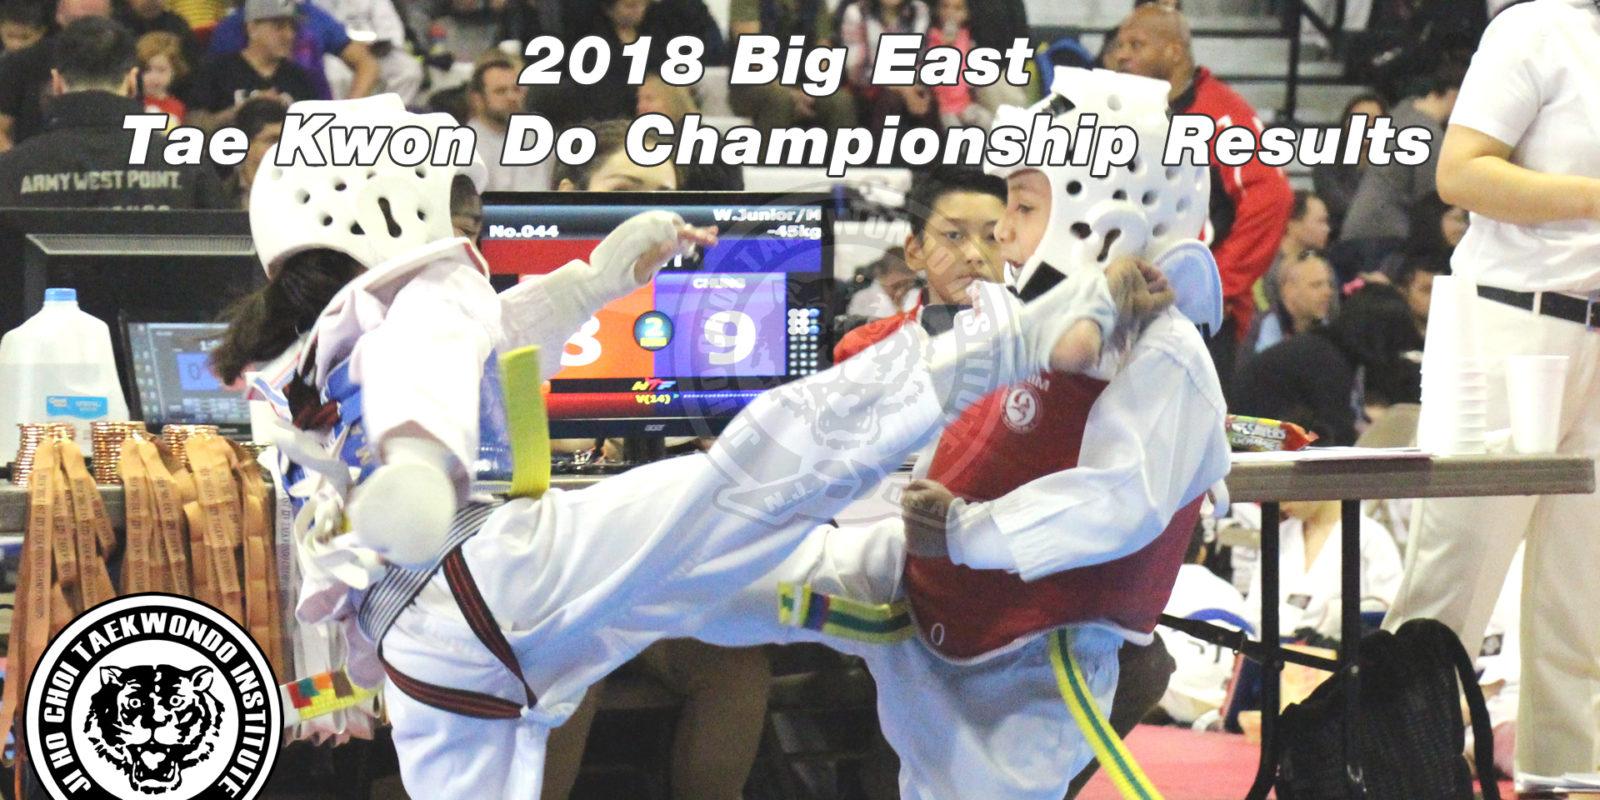 2018 Big East Taekwondo Championships Results